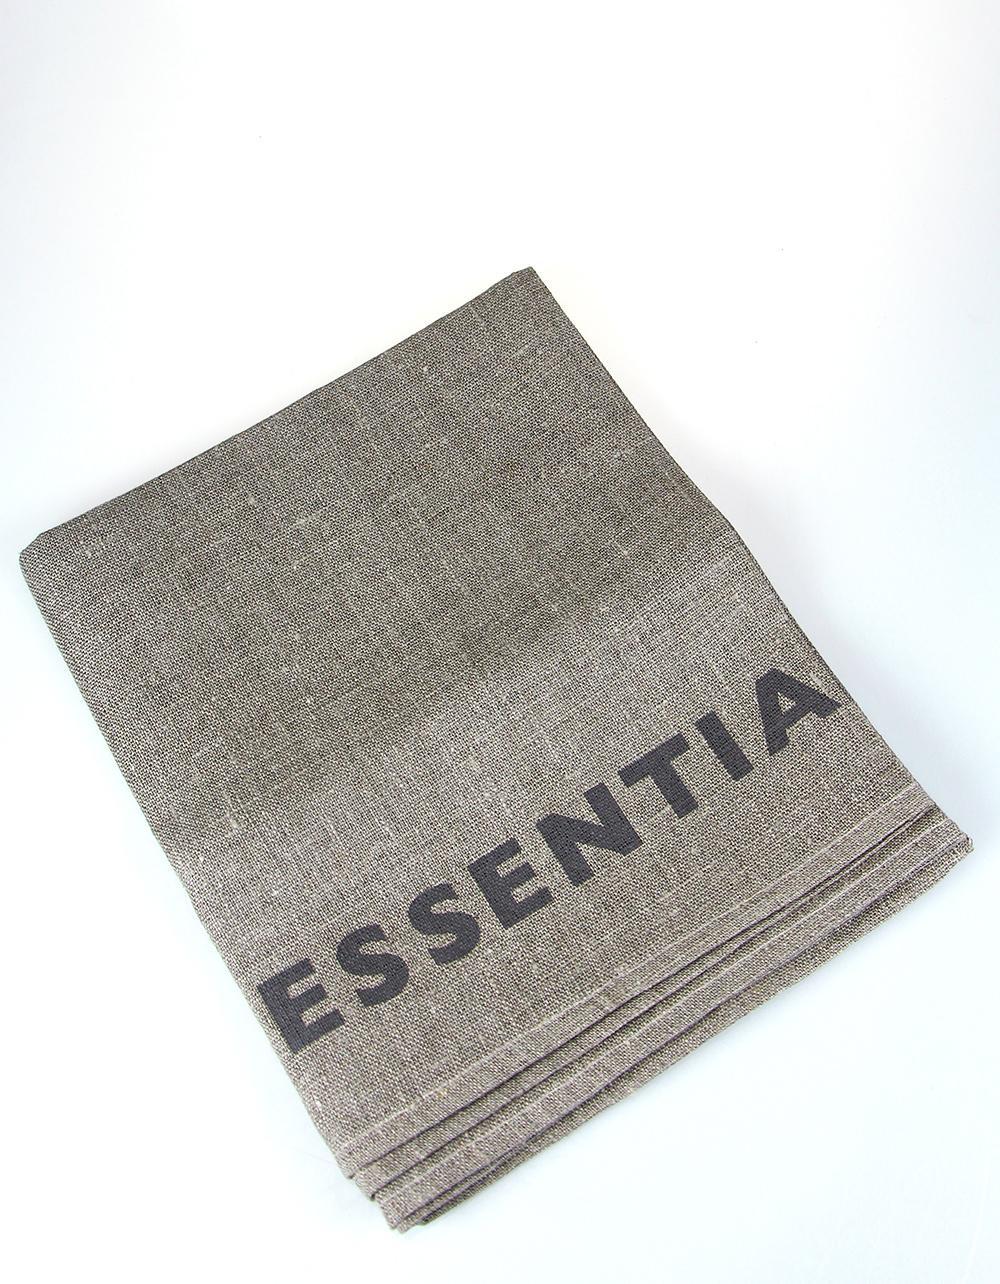 The Essential Ingredient Pure Linen Tea Towel - Natural 80cm x 47cm